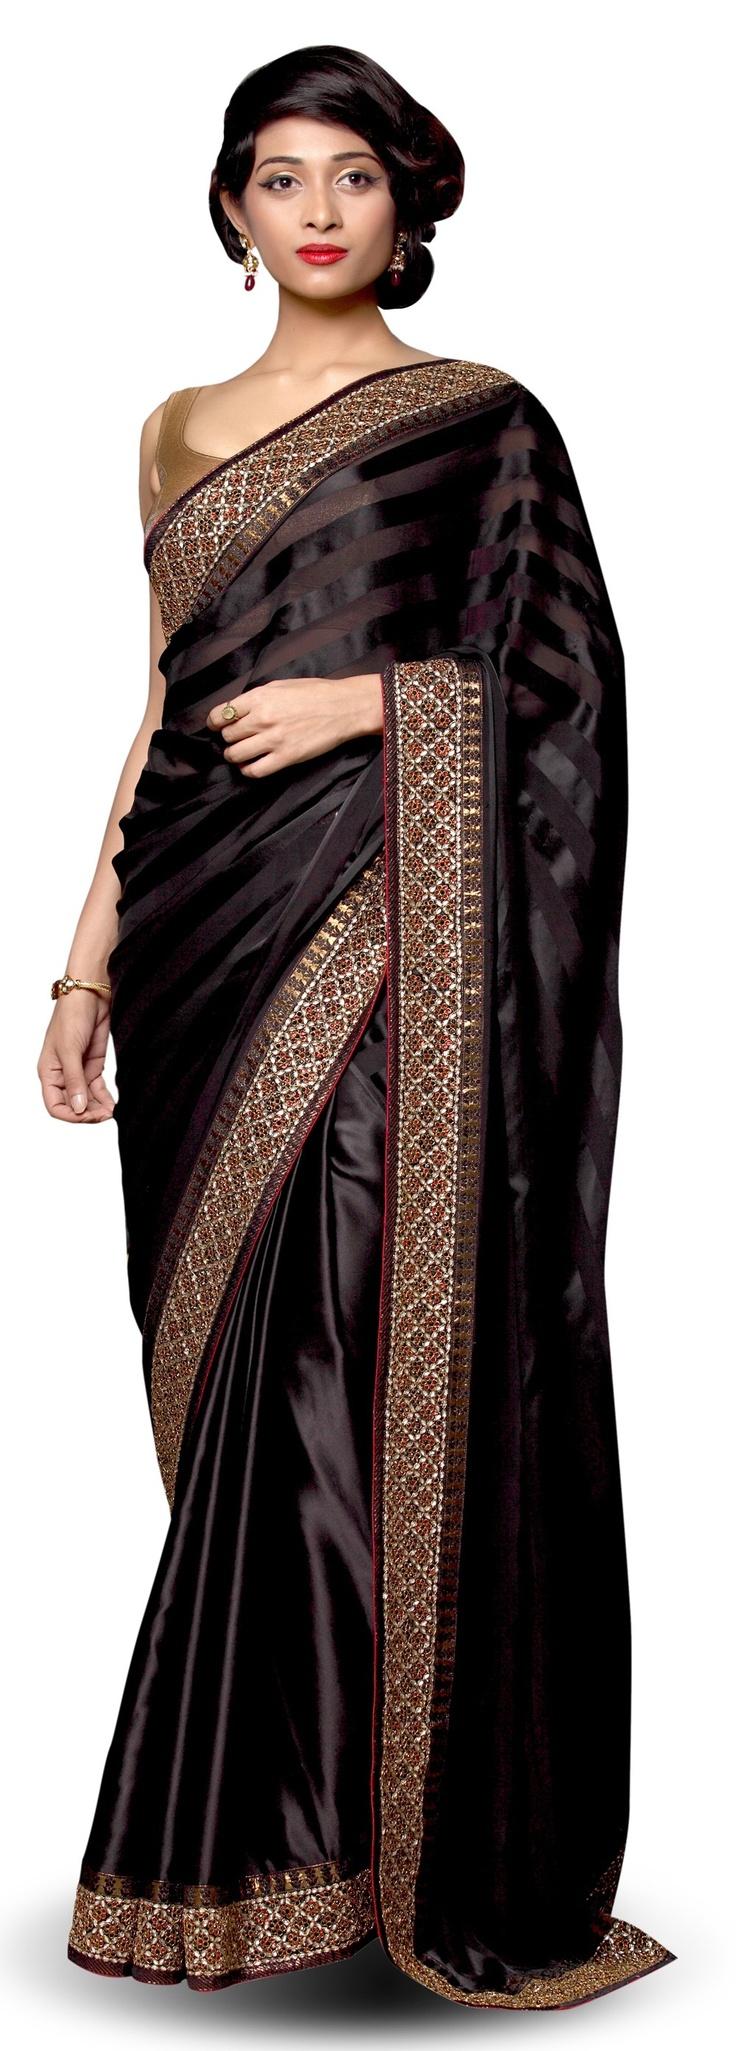 Indian nacked women-5525